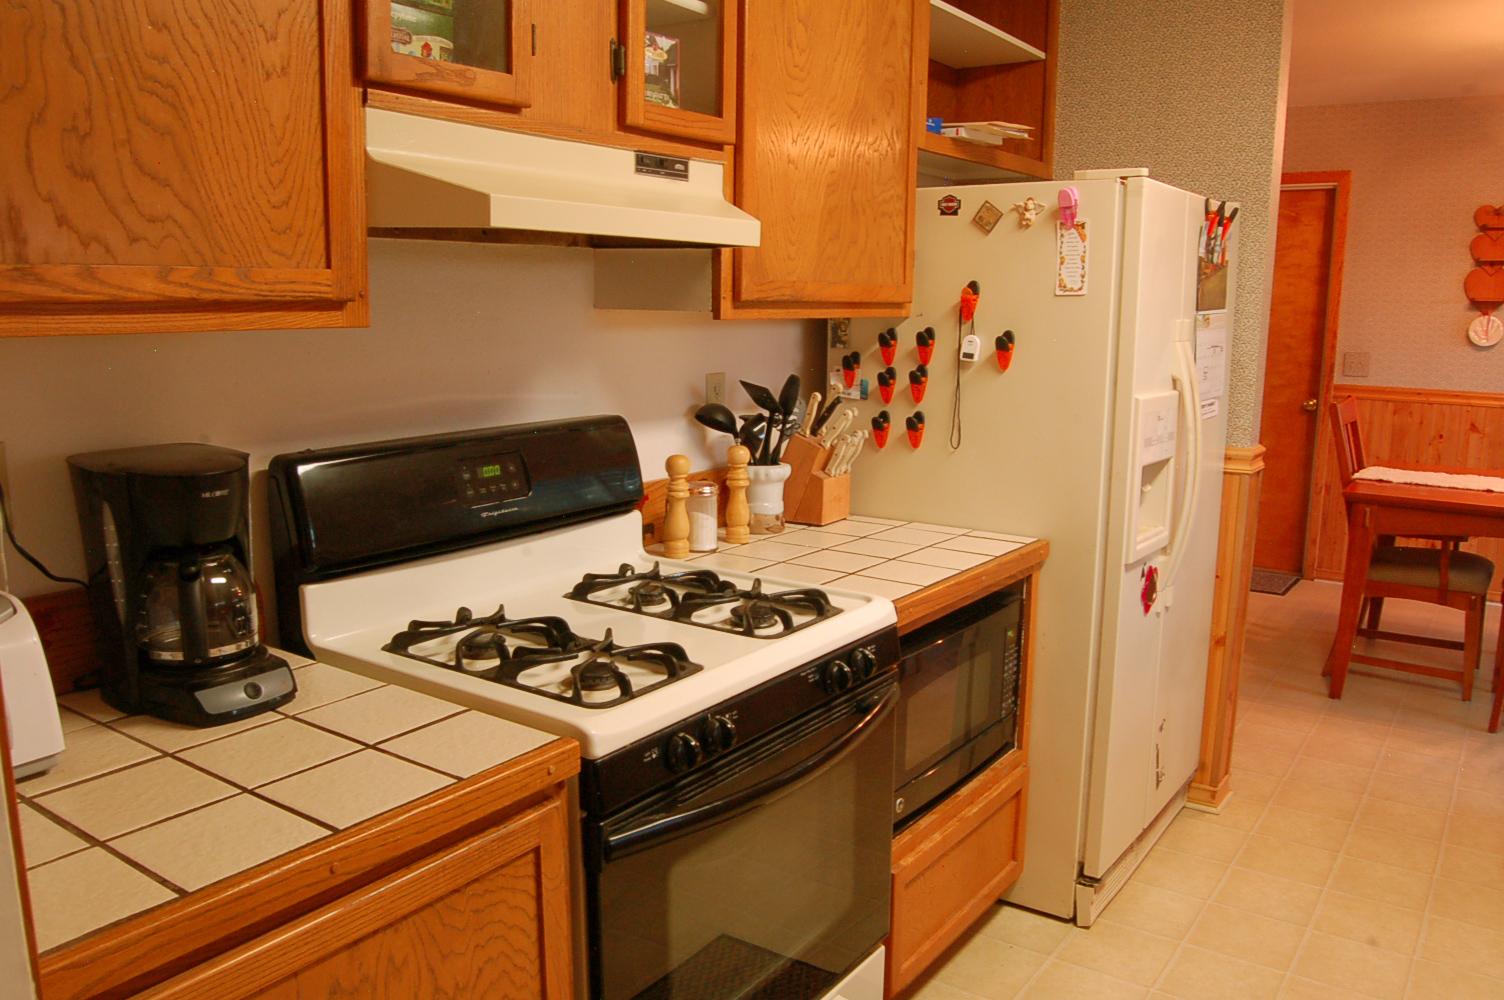 17410-Hooker-Creek-Rd-Cottonwood-CA-kitchen3